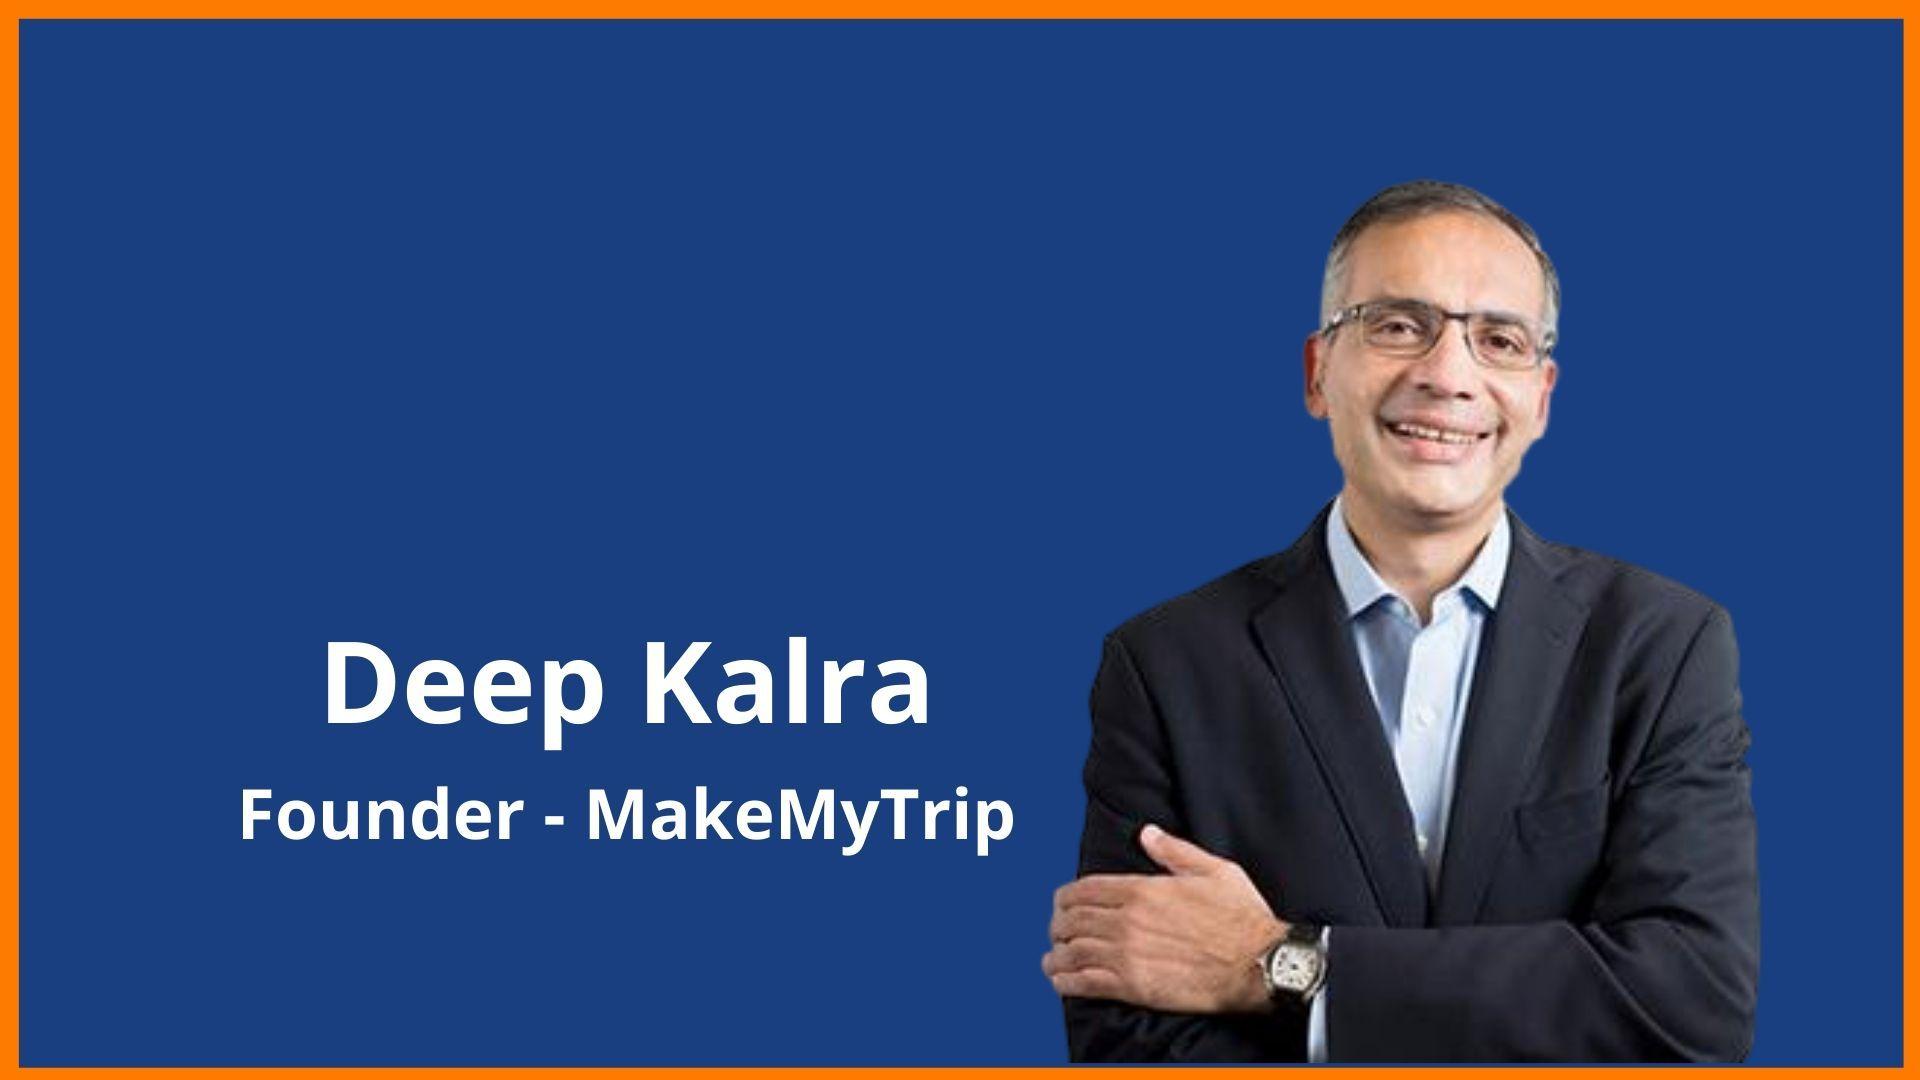 MakeMyTrip Success Story - Founder | Business | Model | Funding | Revenue | News